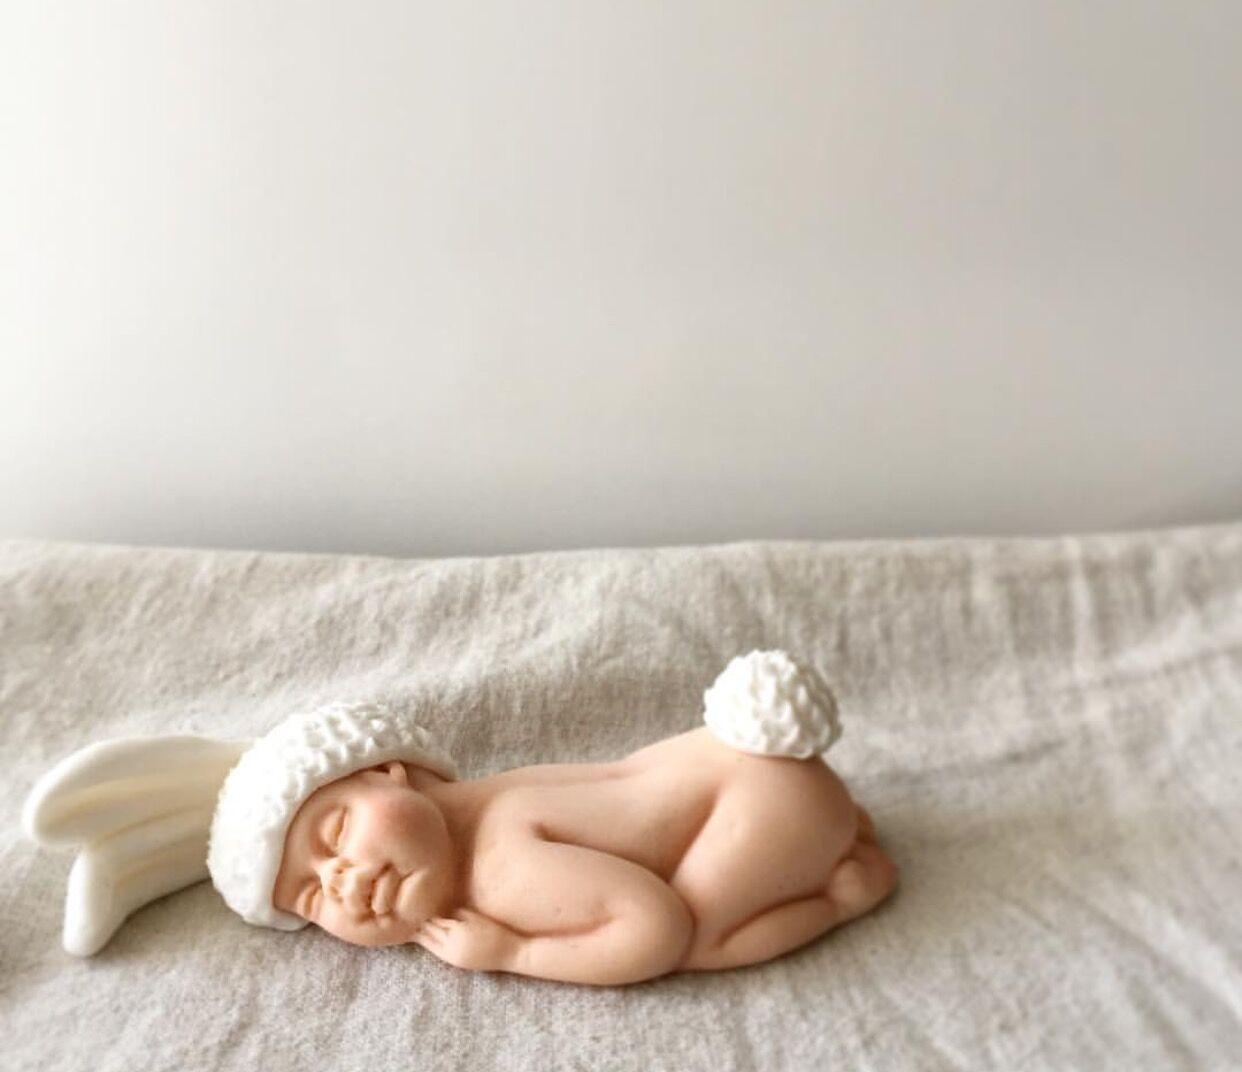 Baby fondant figurine in bunny suit